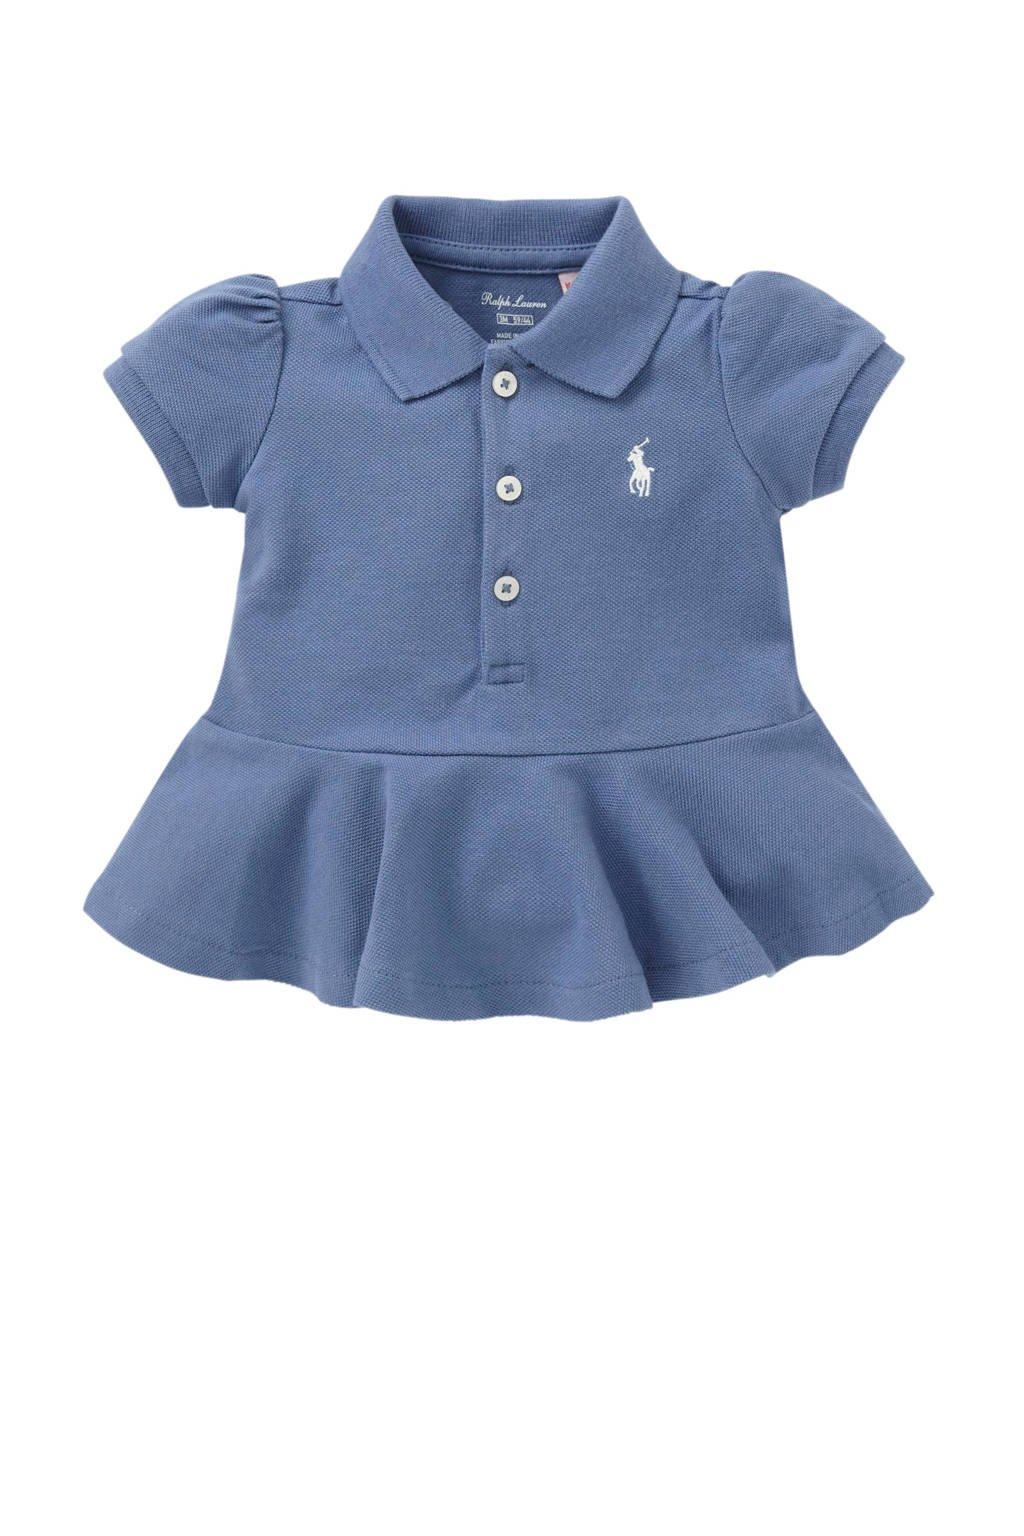 POLO Ralph Lauren baby polo met rushes blauw, Jeans blauw